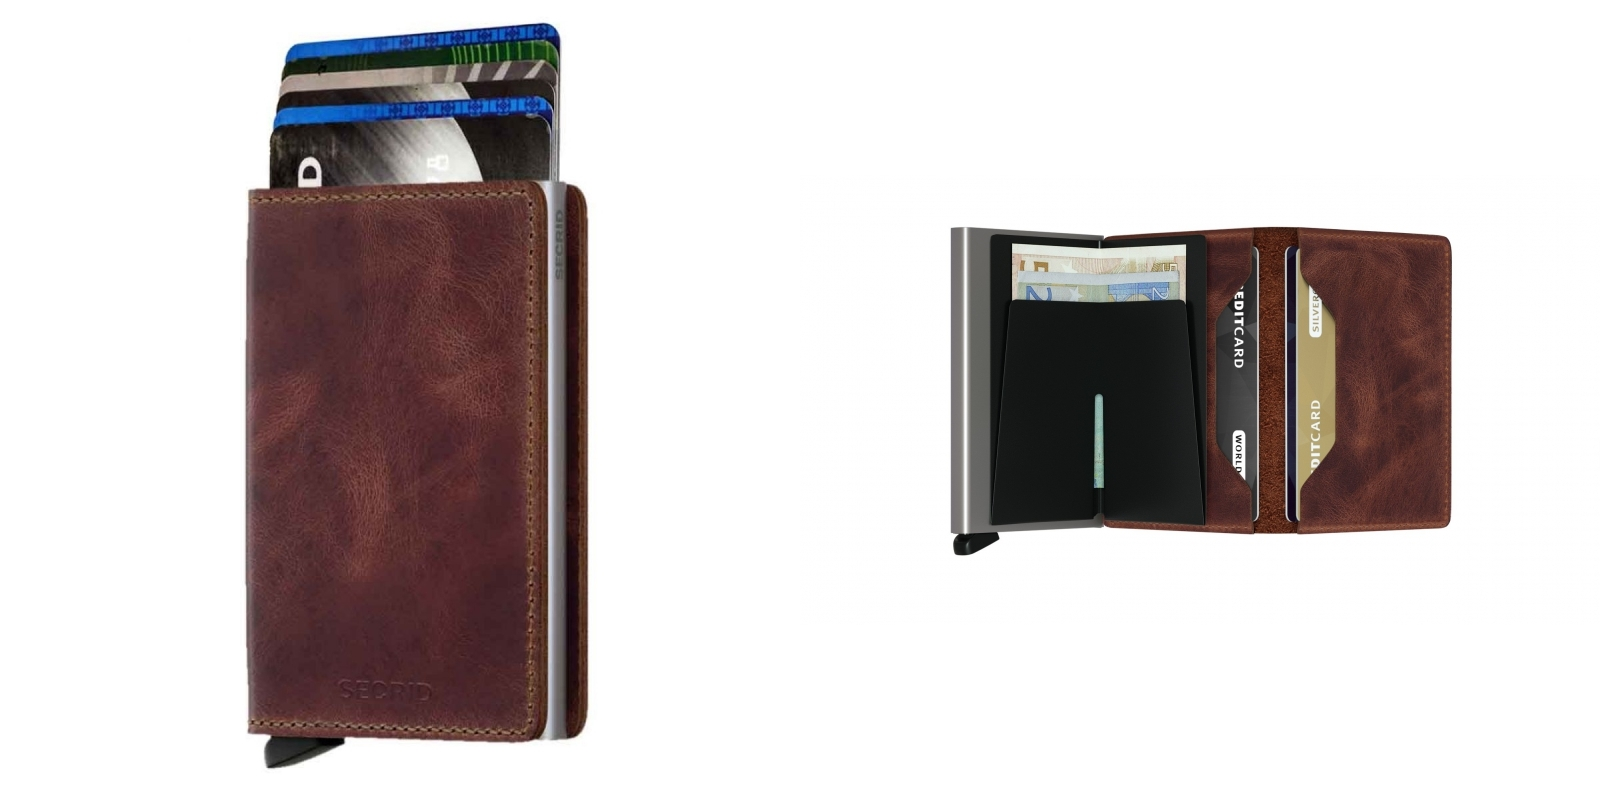 Portfele i etui na karty kredytowe